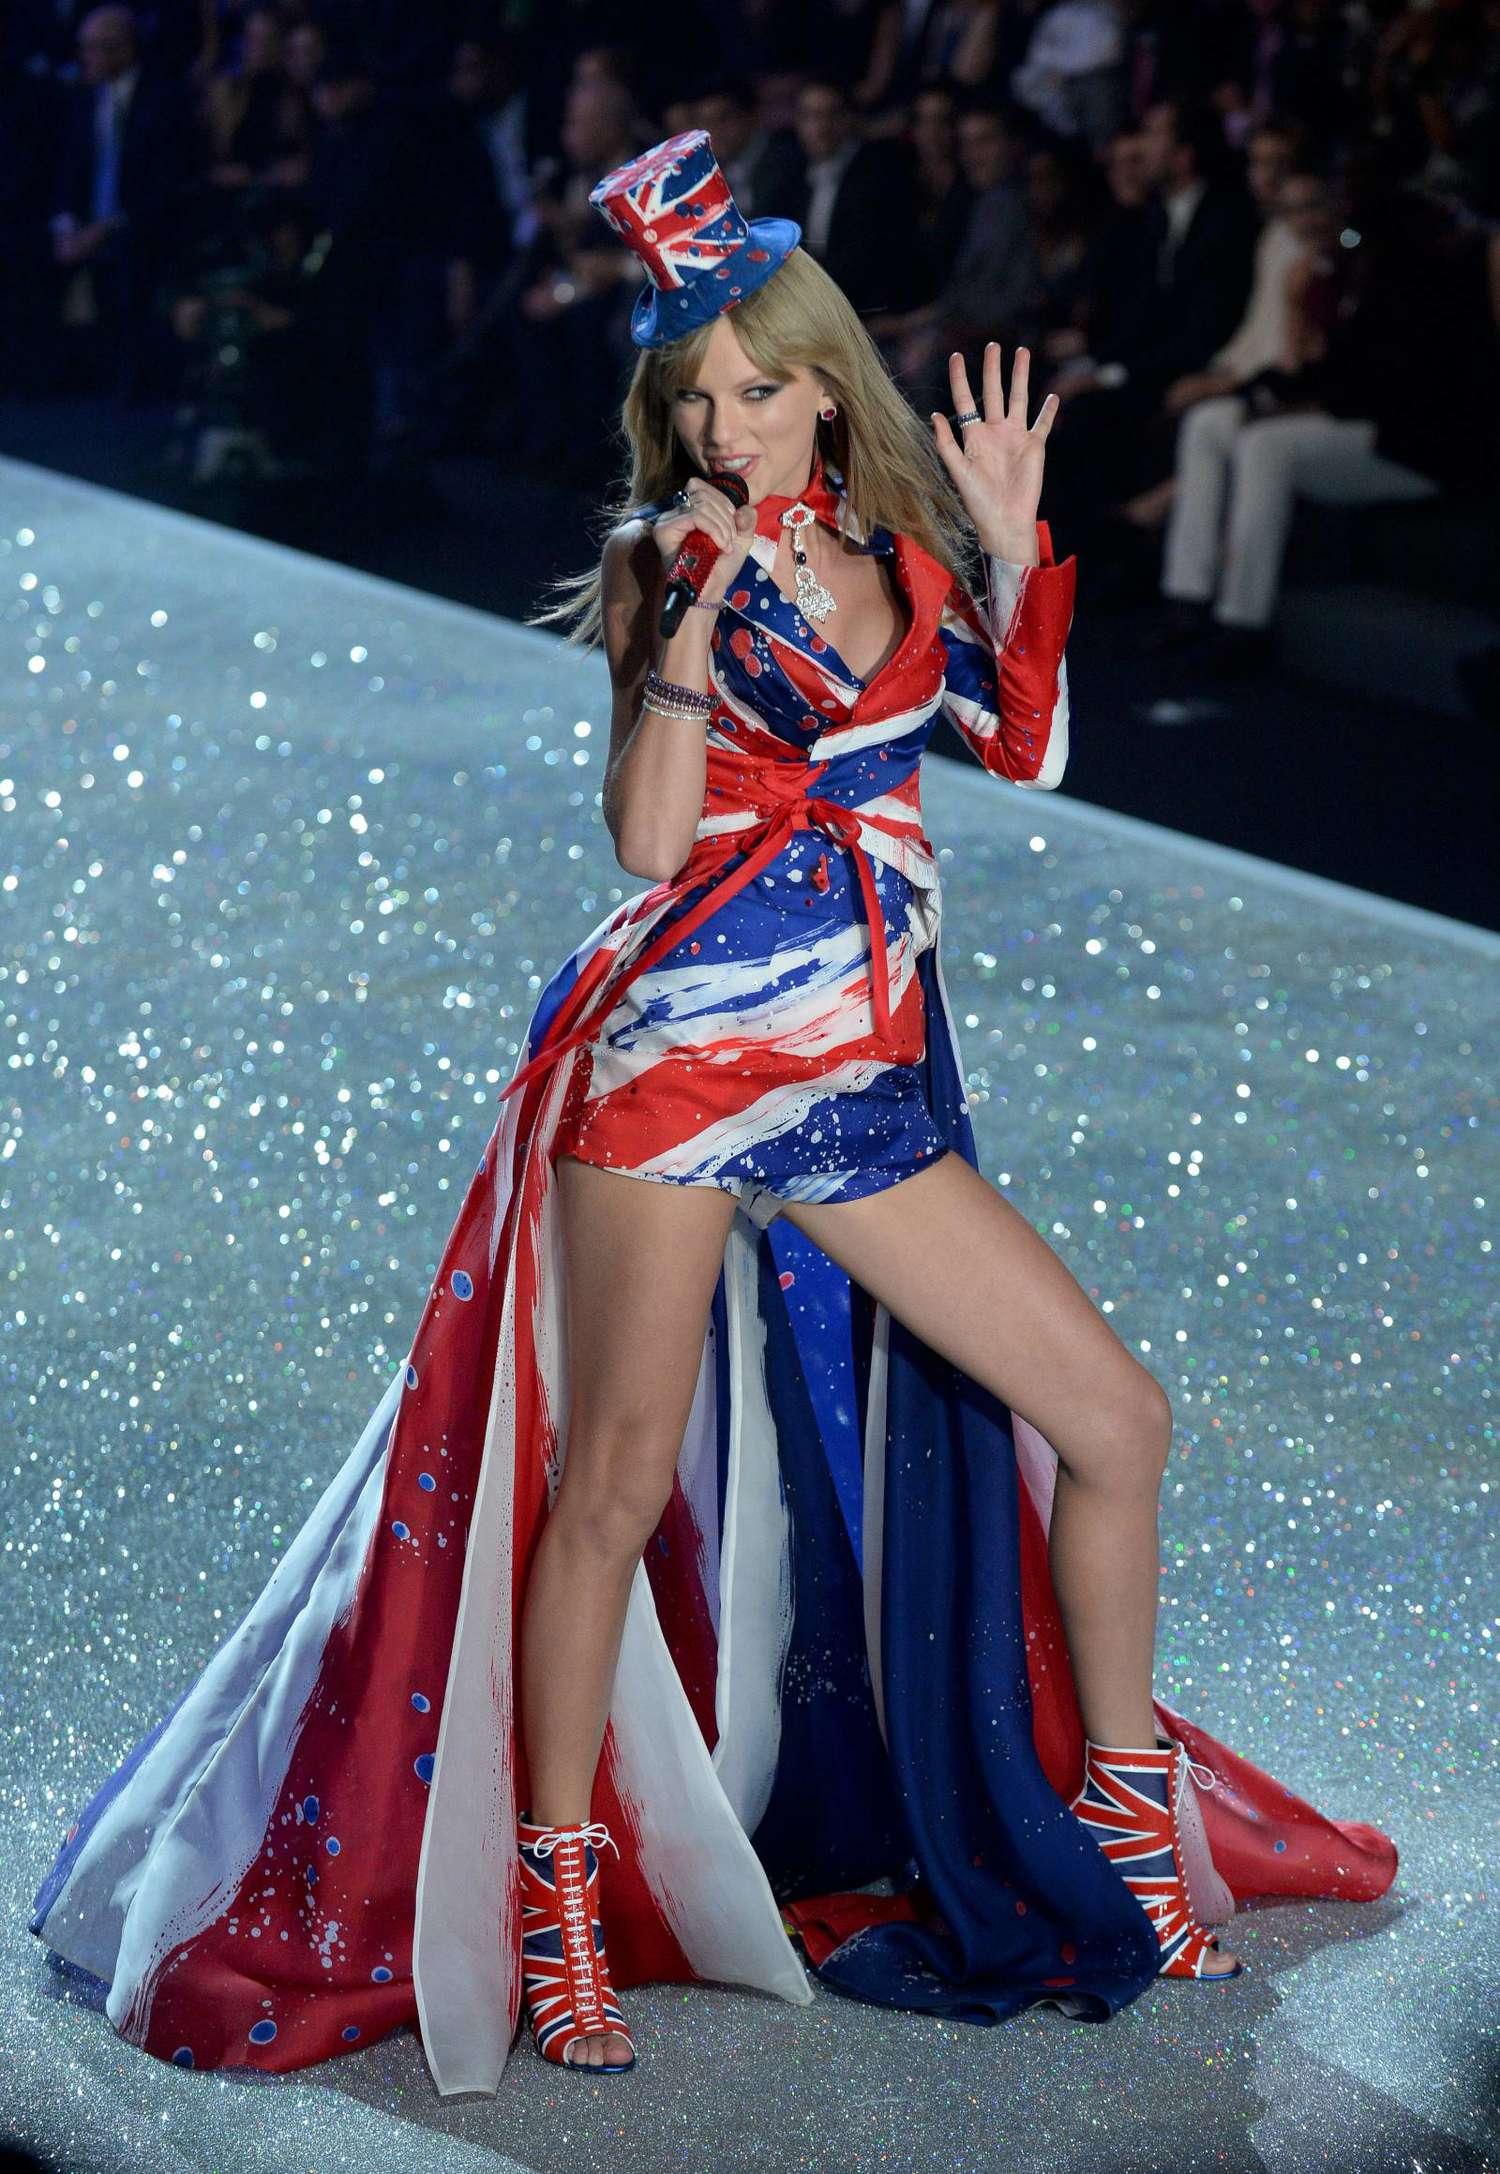 Taylor swift 2013 vs fashion show 11 gotceleb Taylor swift style live vs fashion show